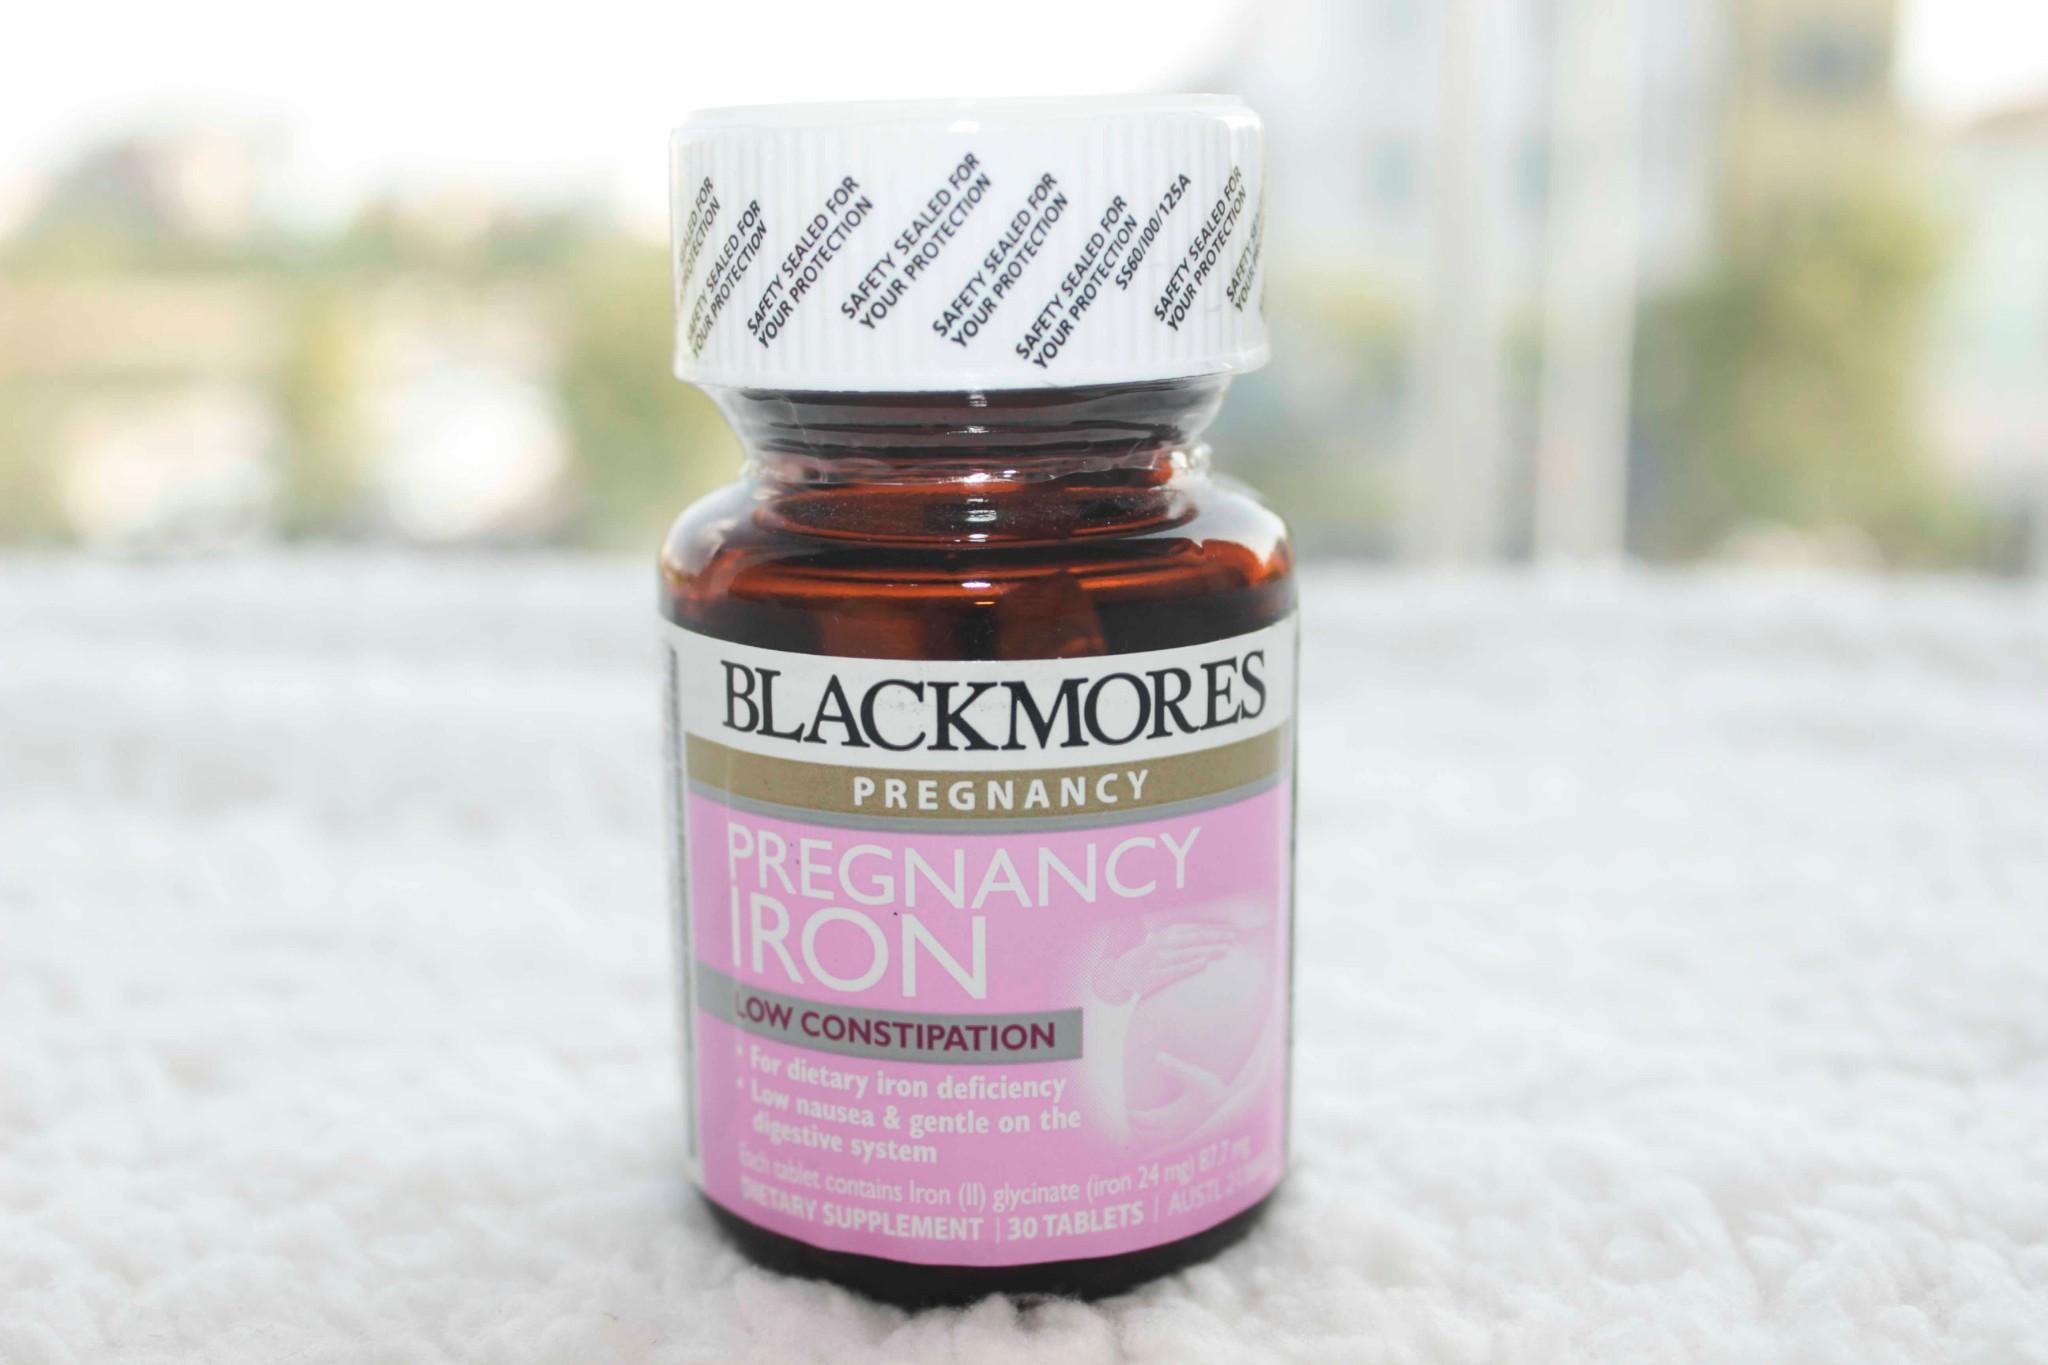 Thuốc Blackmores Pregnancy Iron bổ sung sắt cho bà bầu